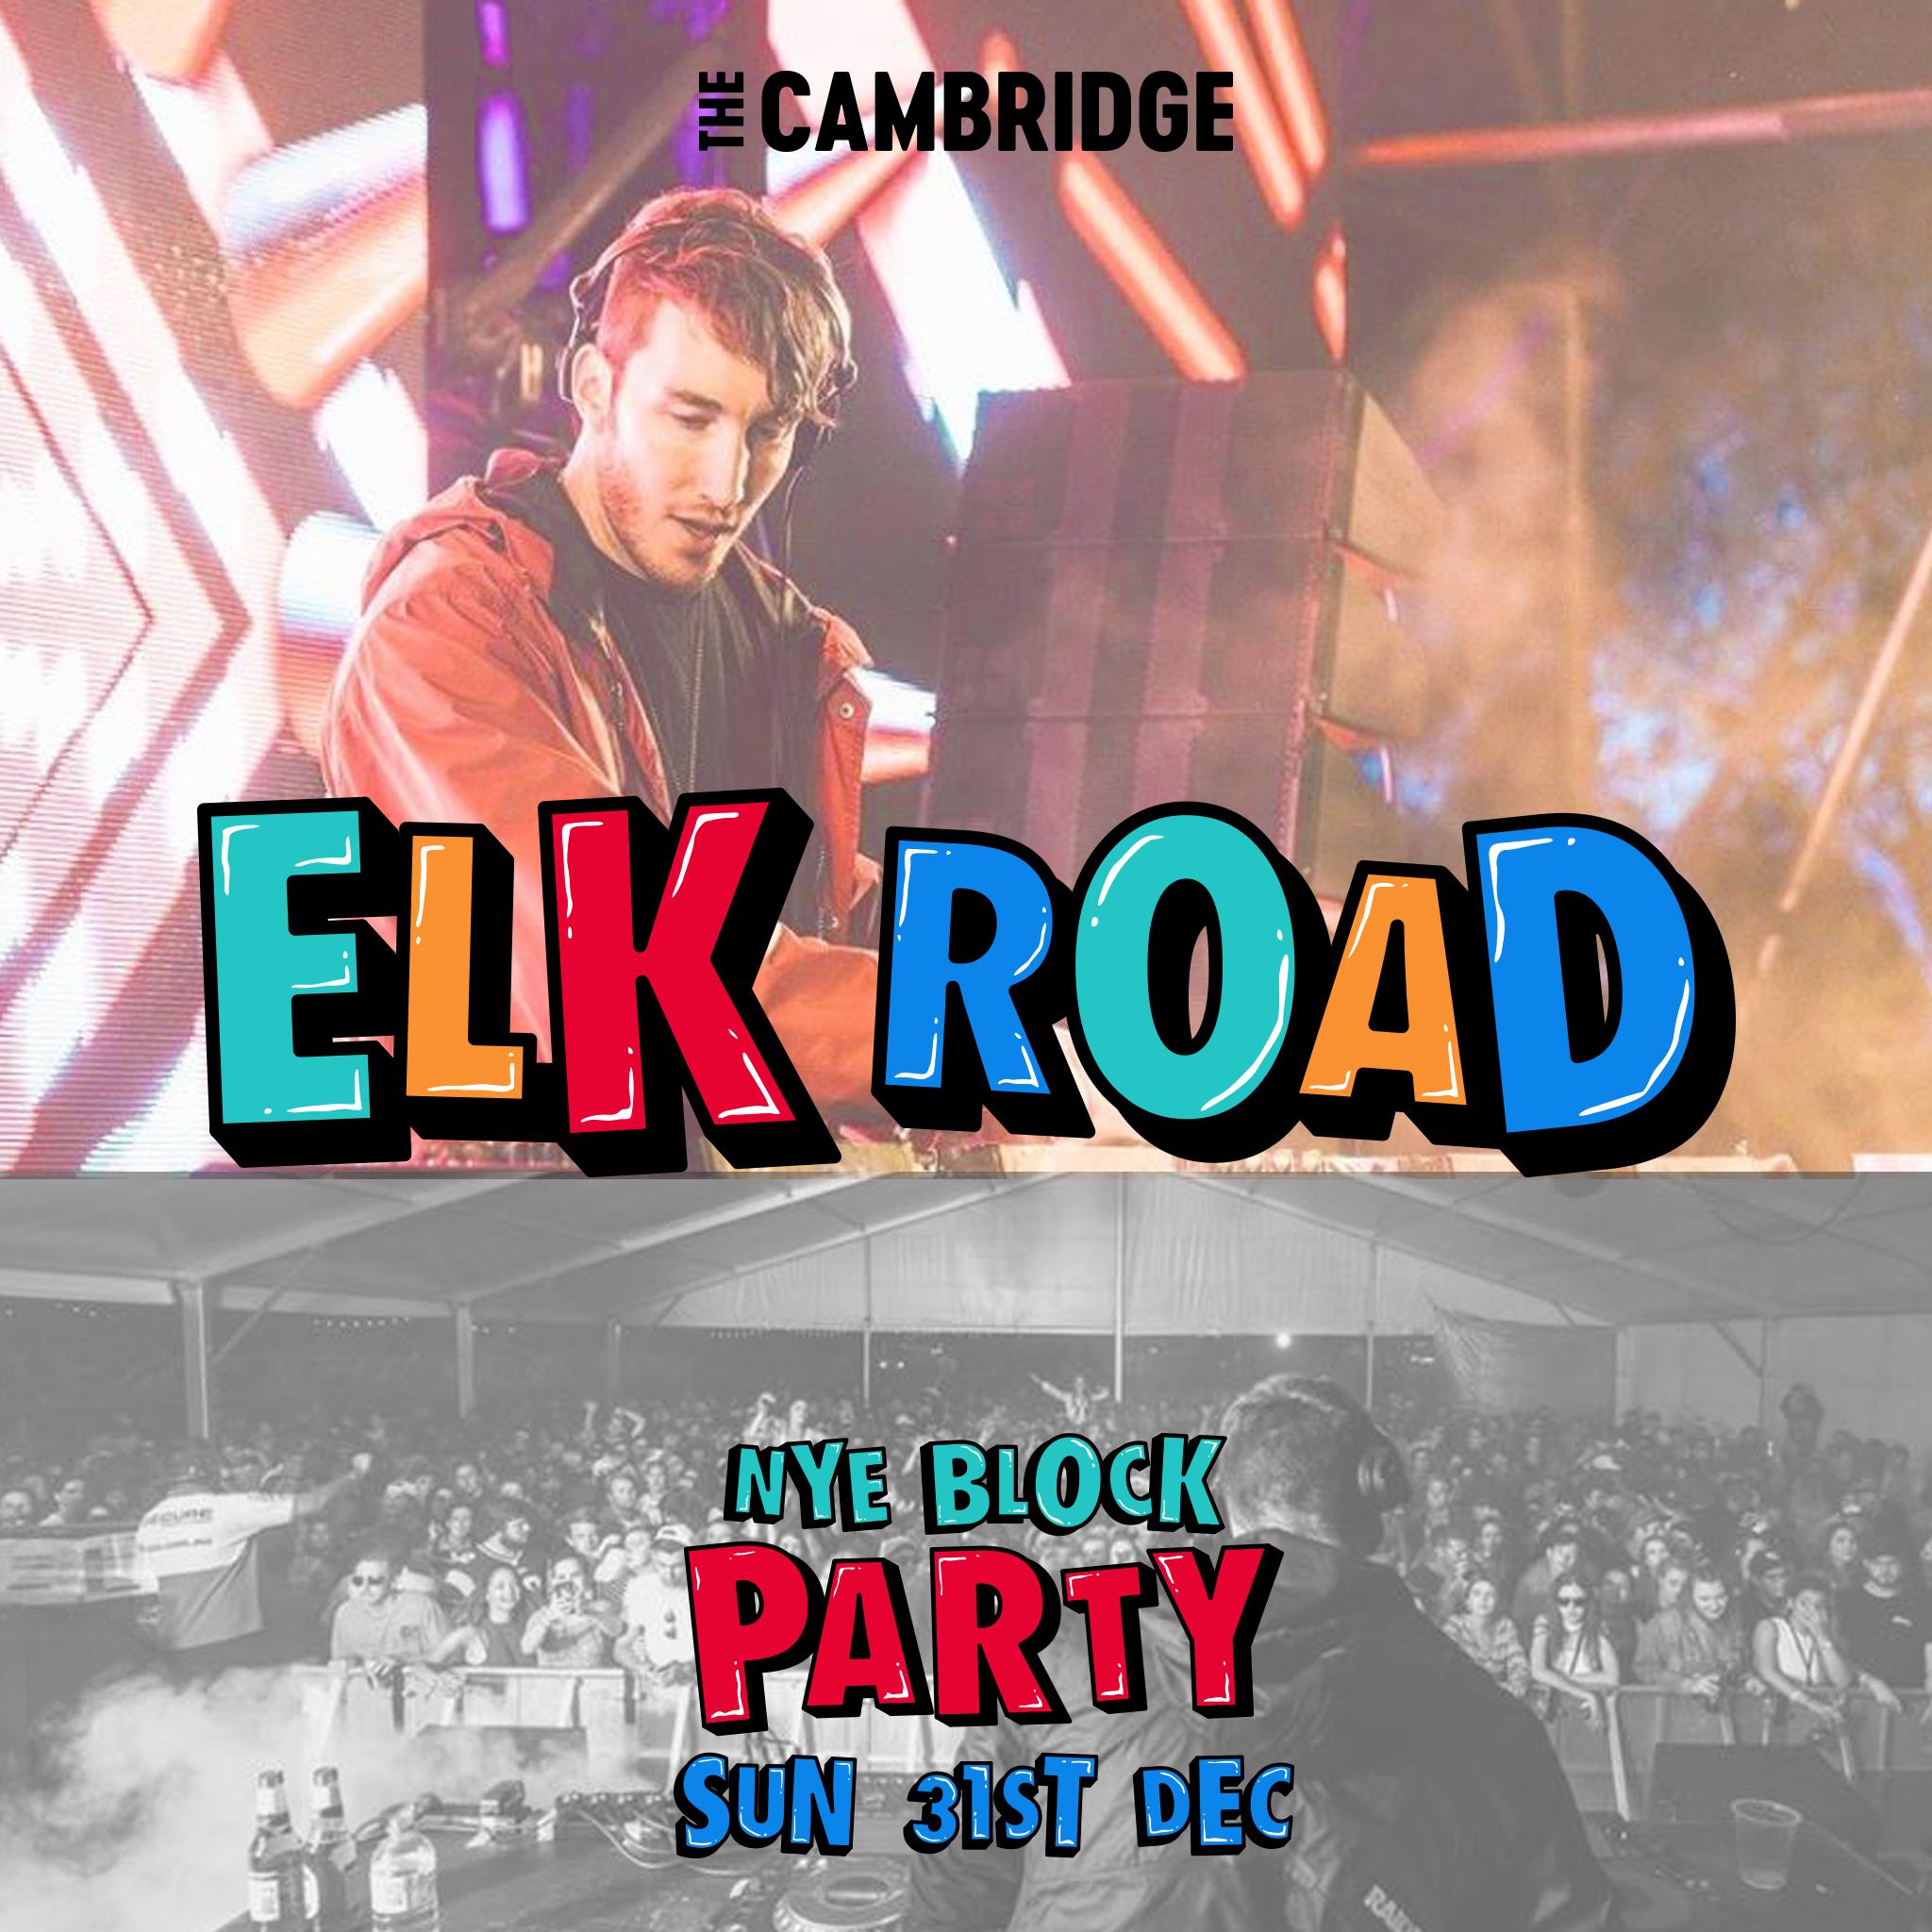 ELK-ROAD.png